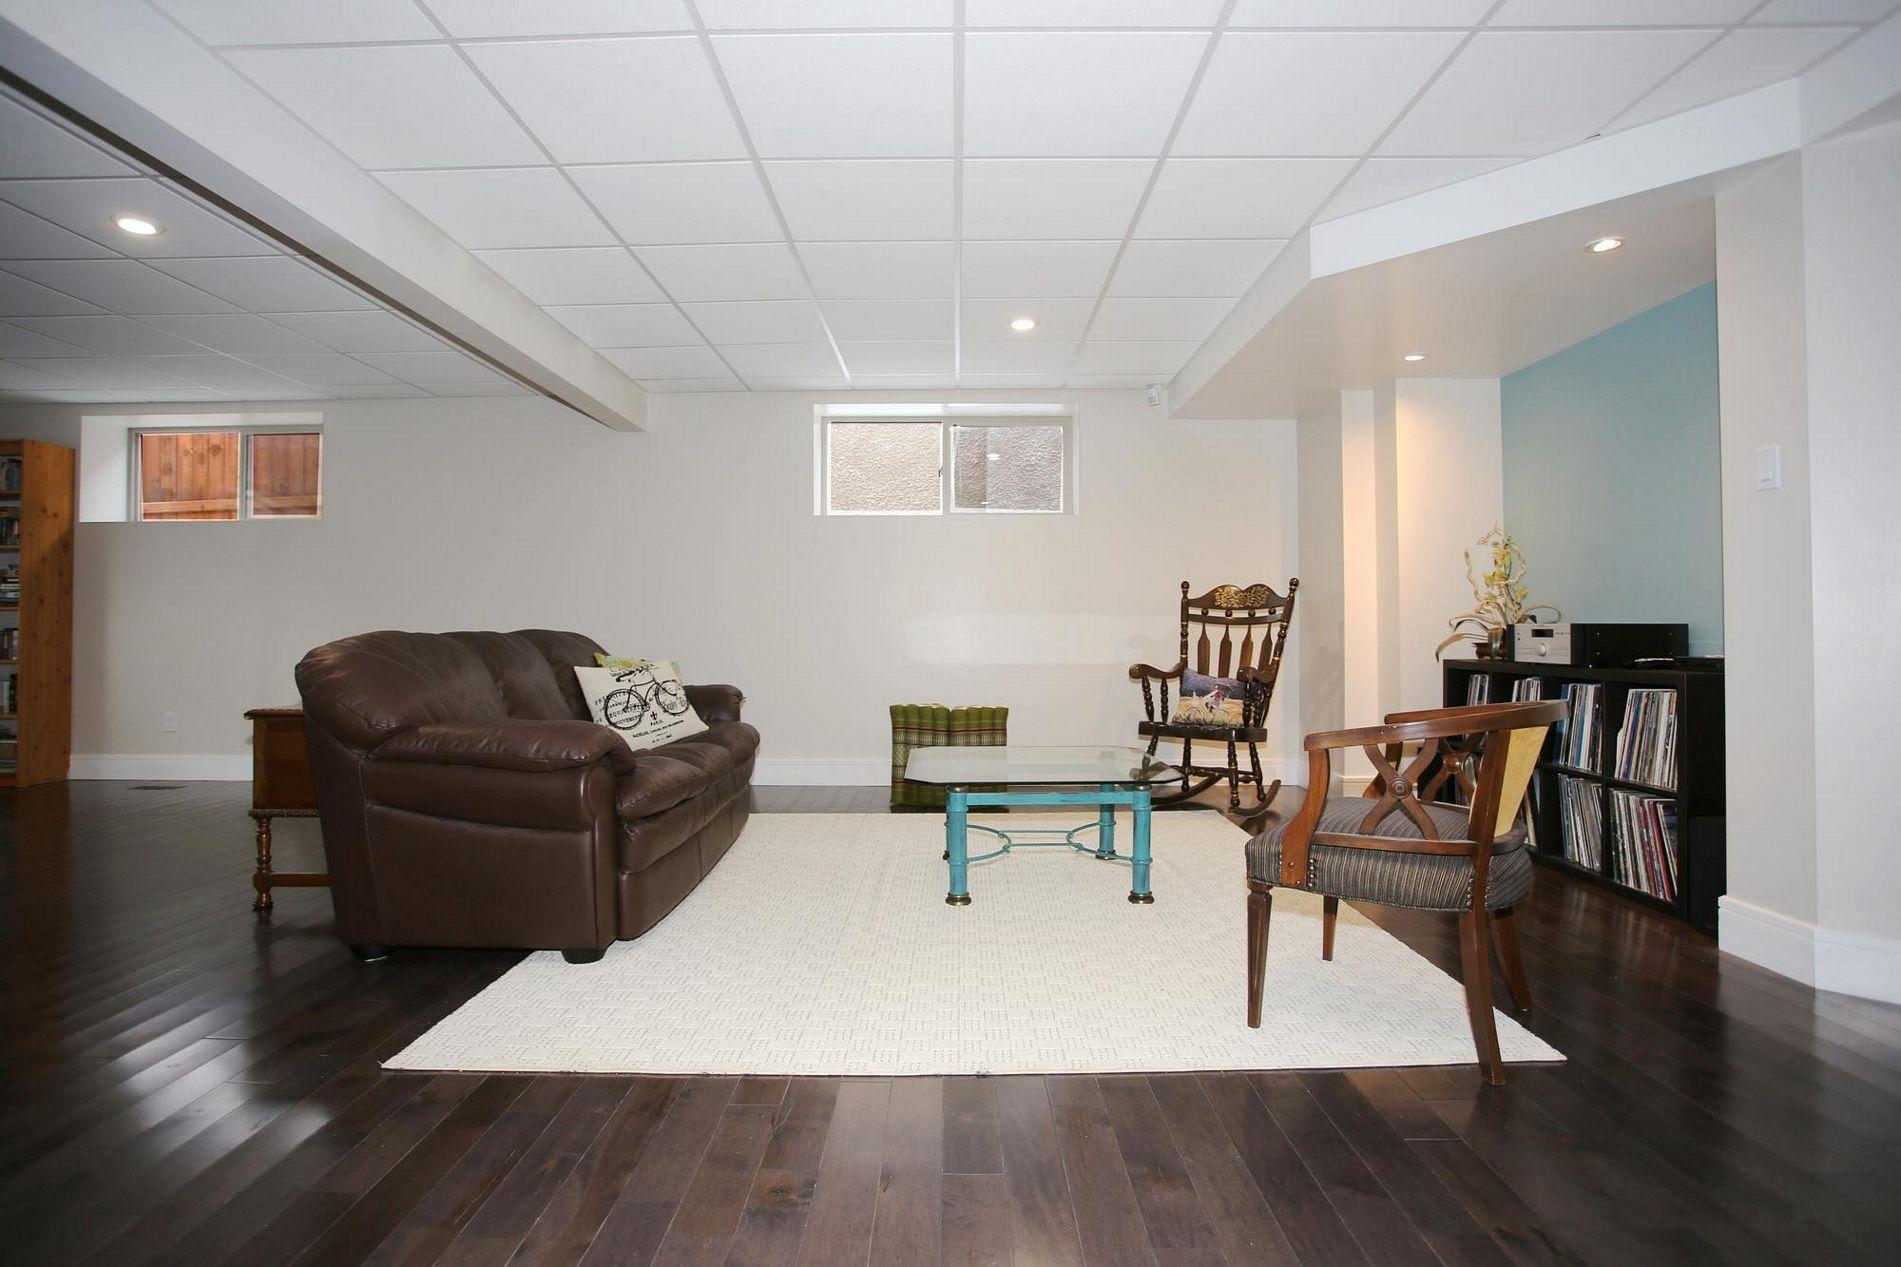 26 Edenwood Place, Winnipeg, Manitoba  R3X 0E4 - Photo 26 - 1831994